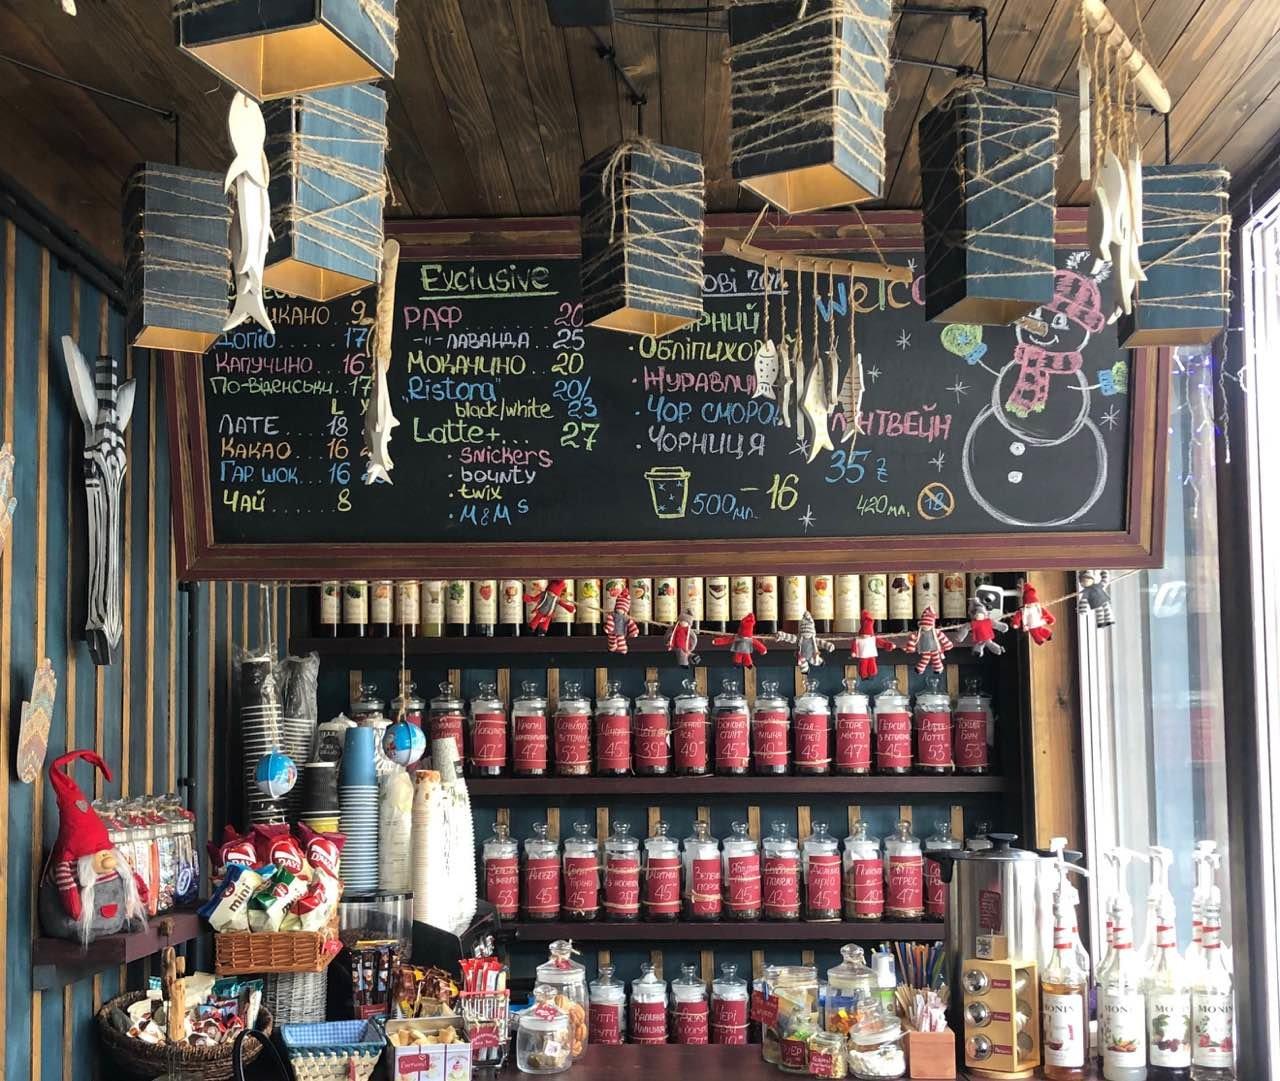 Кохання з присмаком кави: де у Хмельницькому провести День закоханих, фото-2